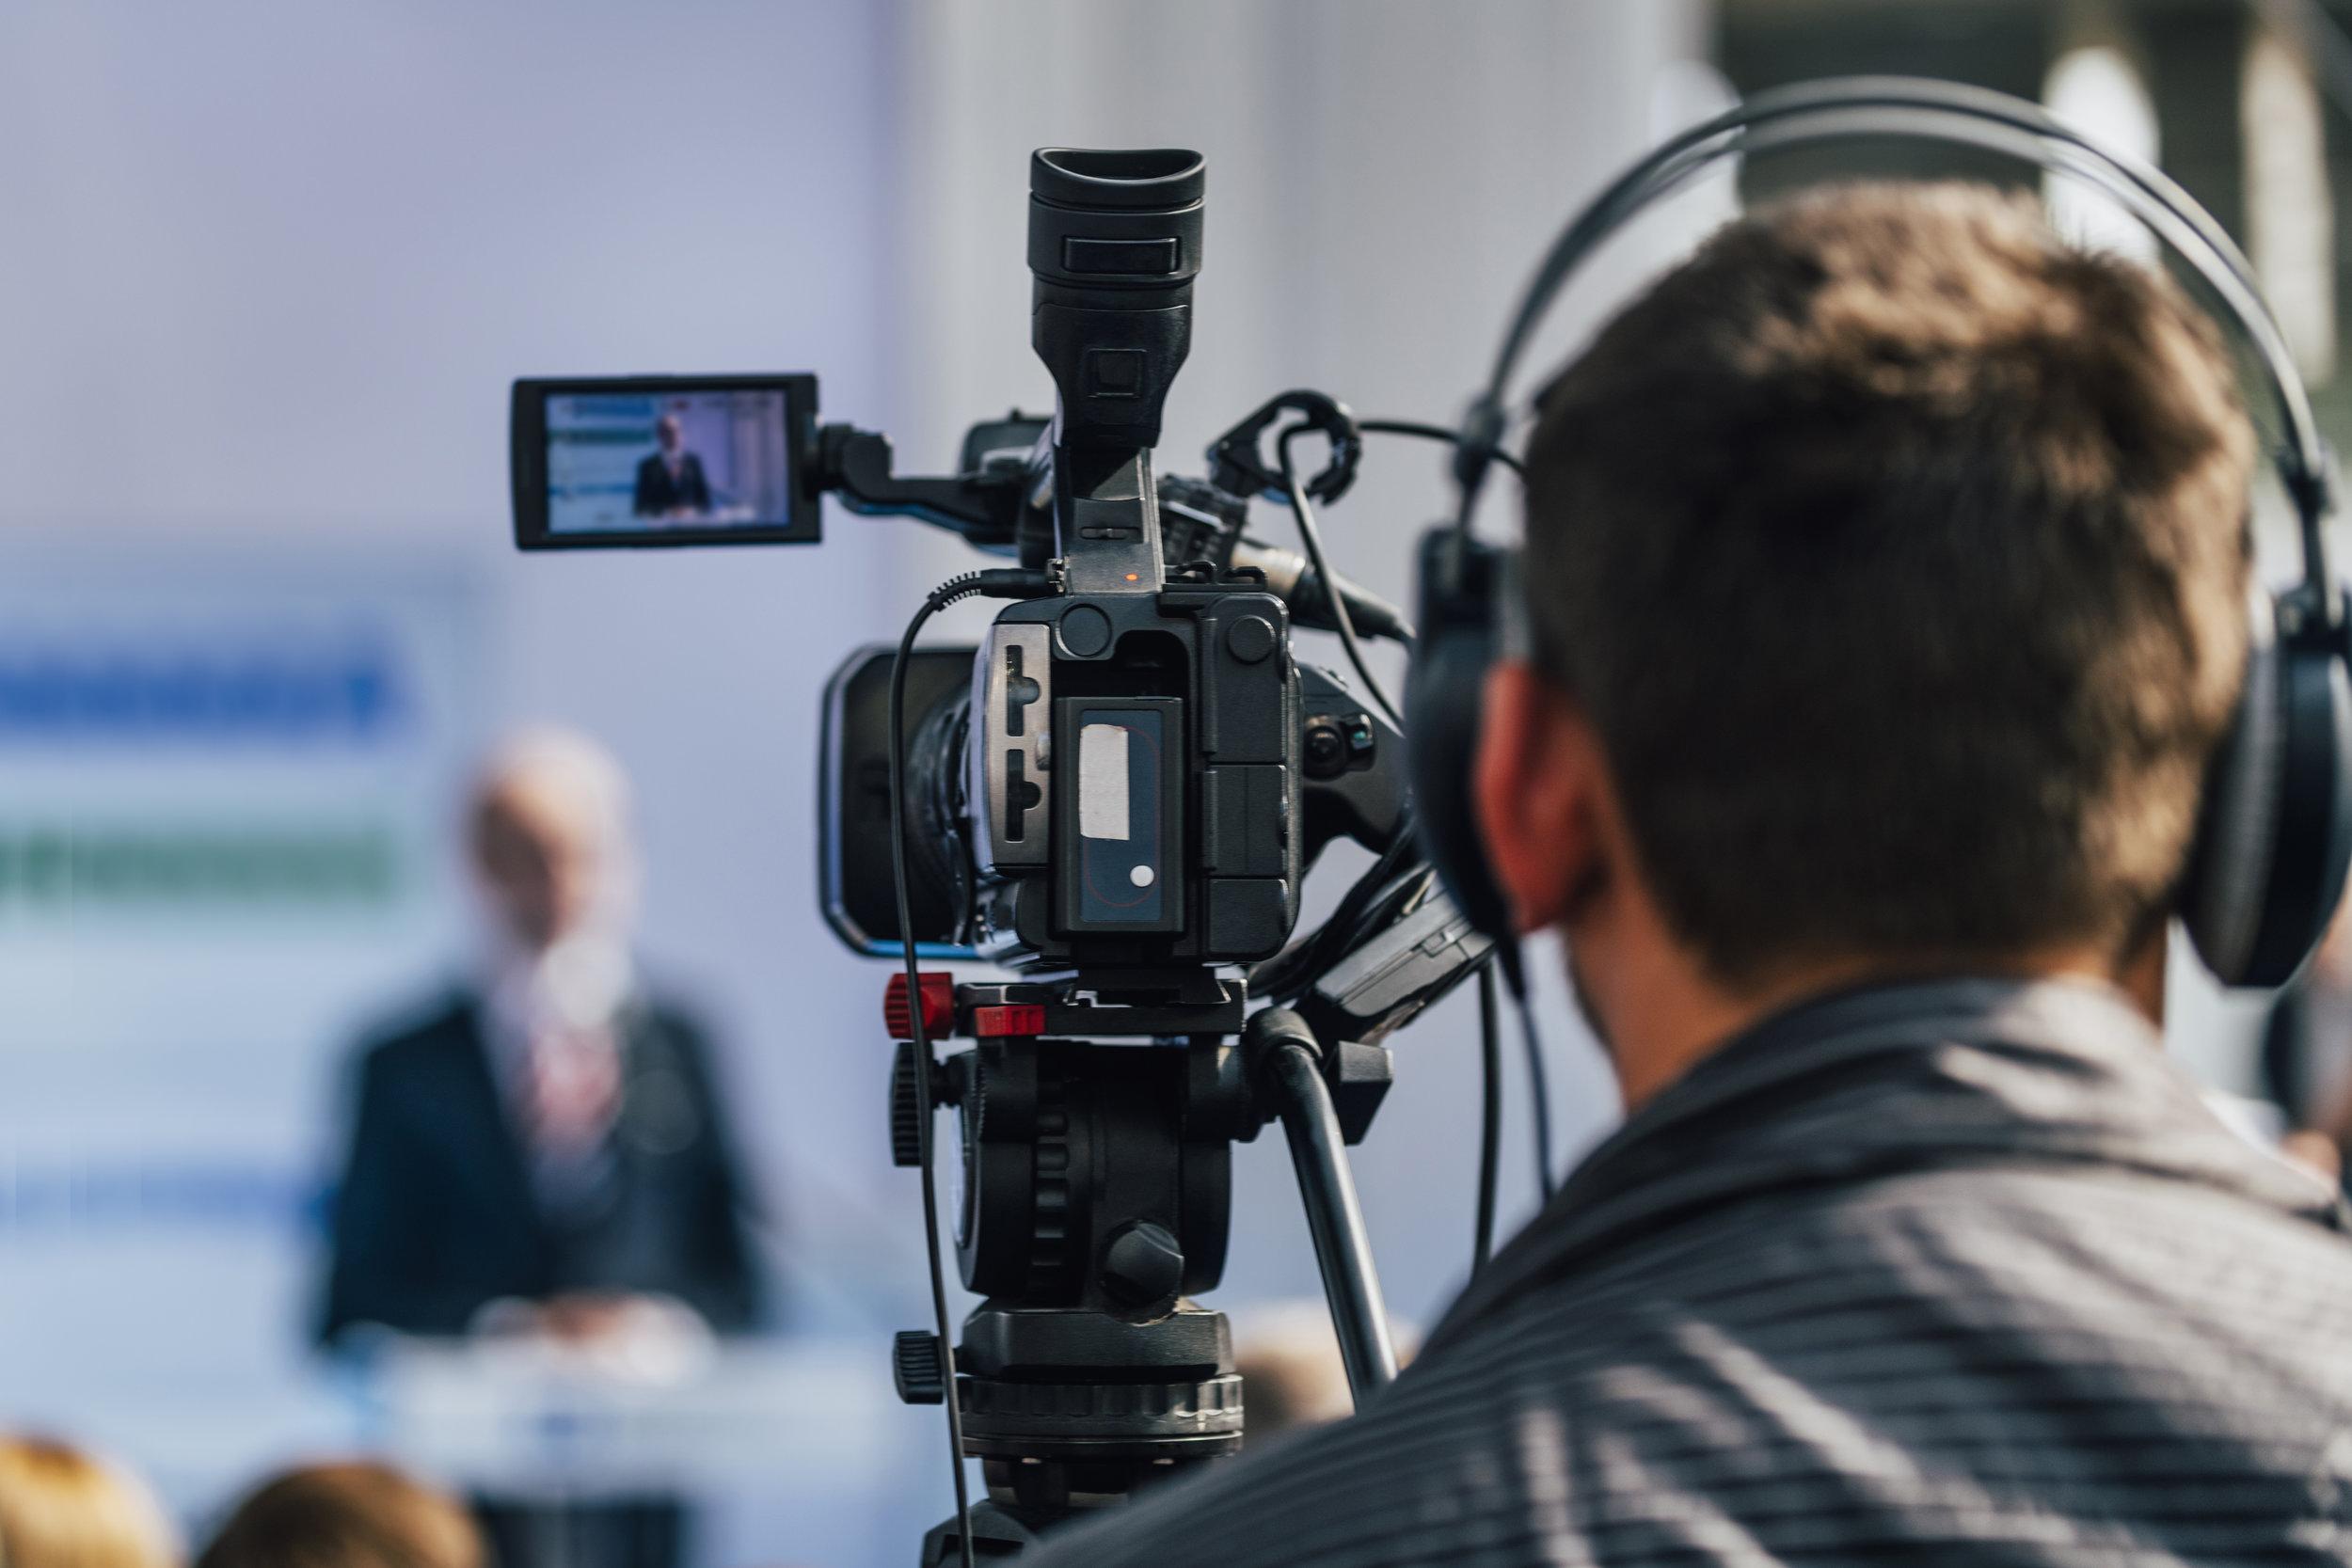 press-conference-event-cameraman-recording-male-KQXCBLM.jpg